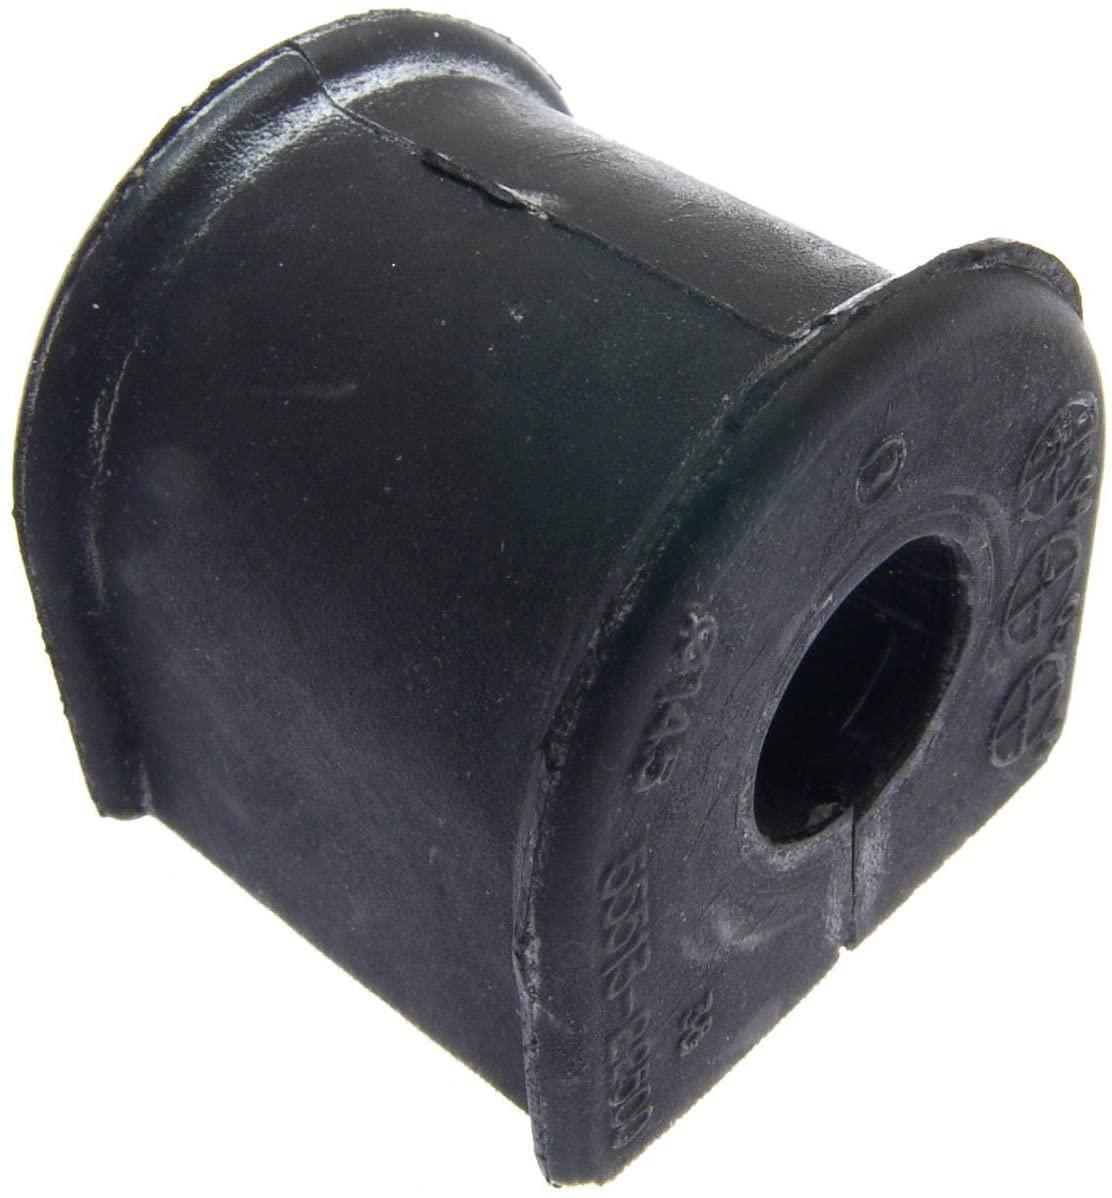 5551322500 - Rear Stabilizer Bushing D14.5 For Hyundai/Kia